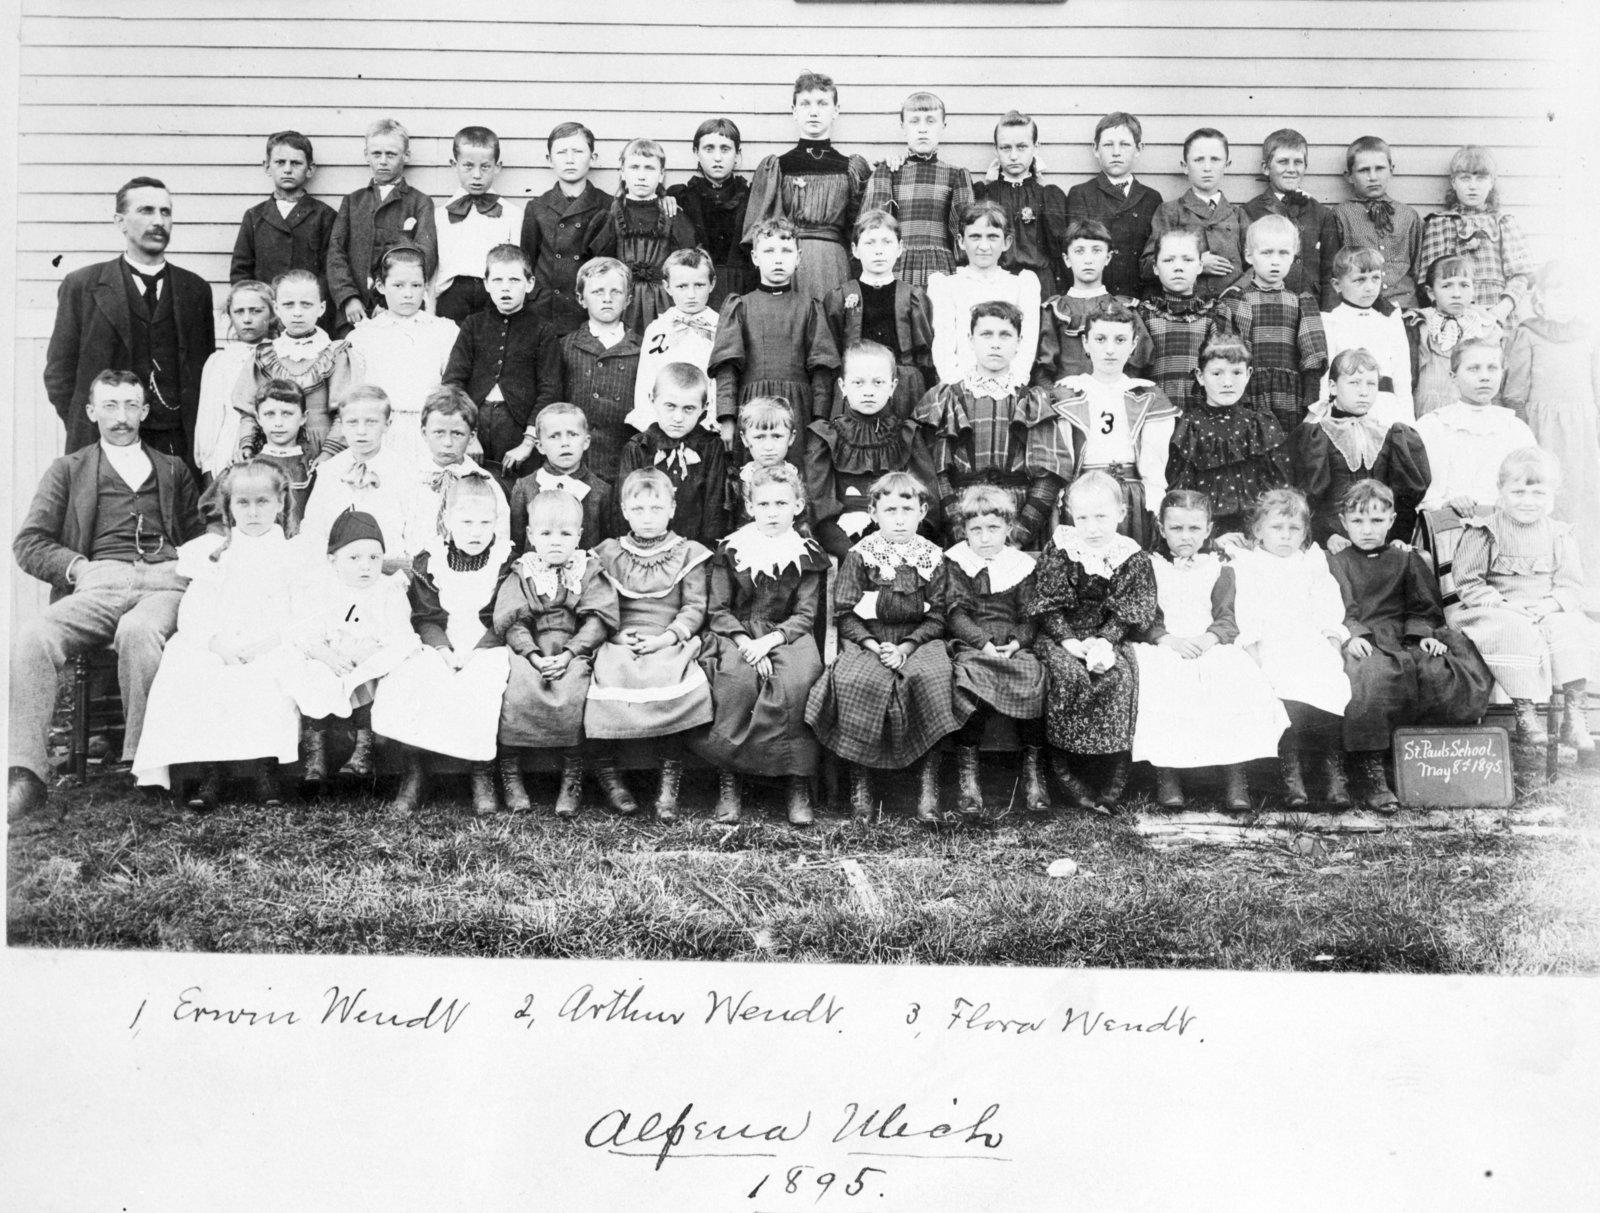 St. Paul Lutheran Church School Students, 1895